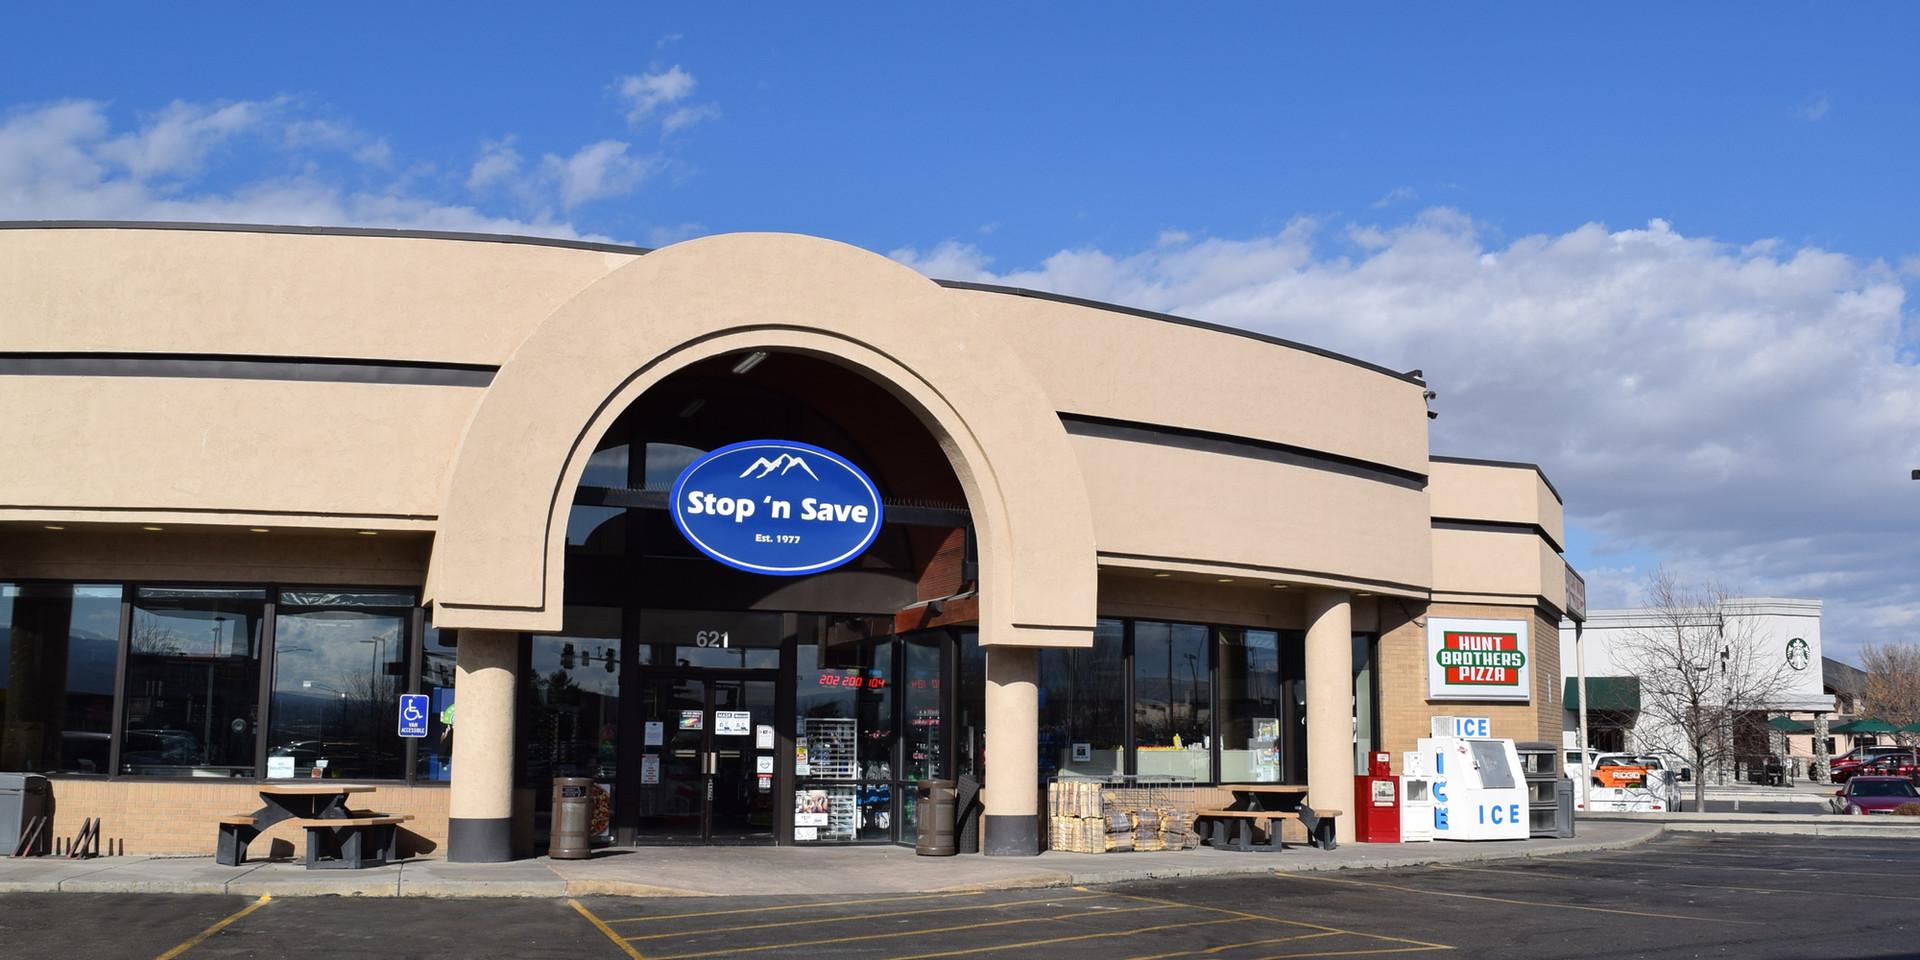 Storefront Angled Wide.jpeg